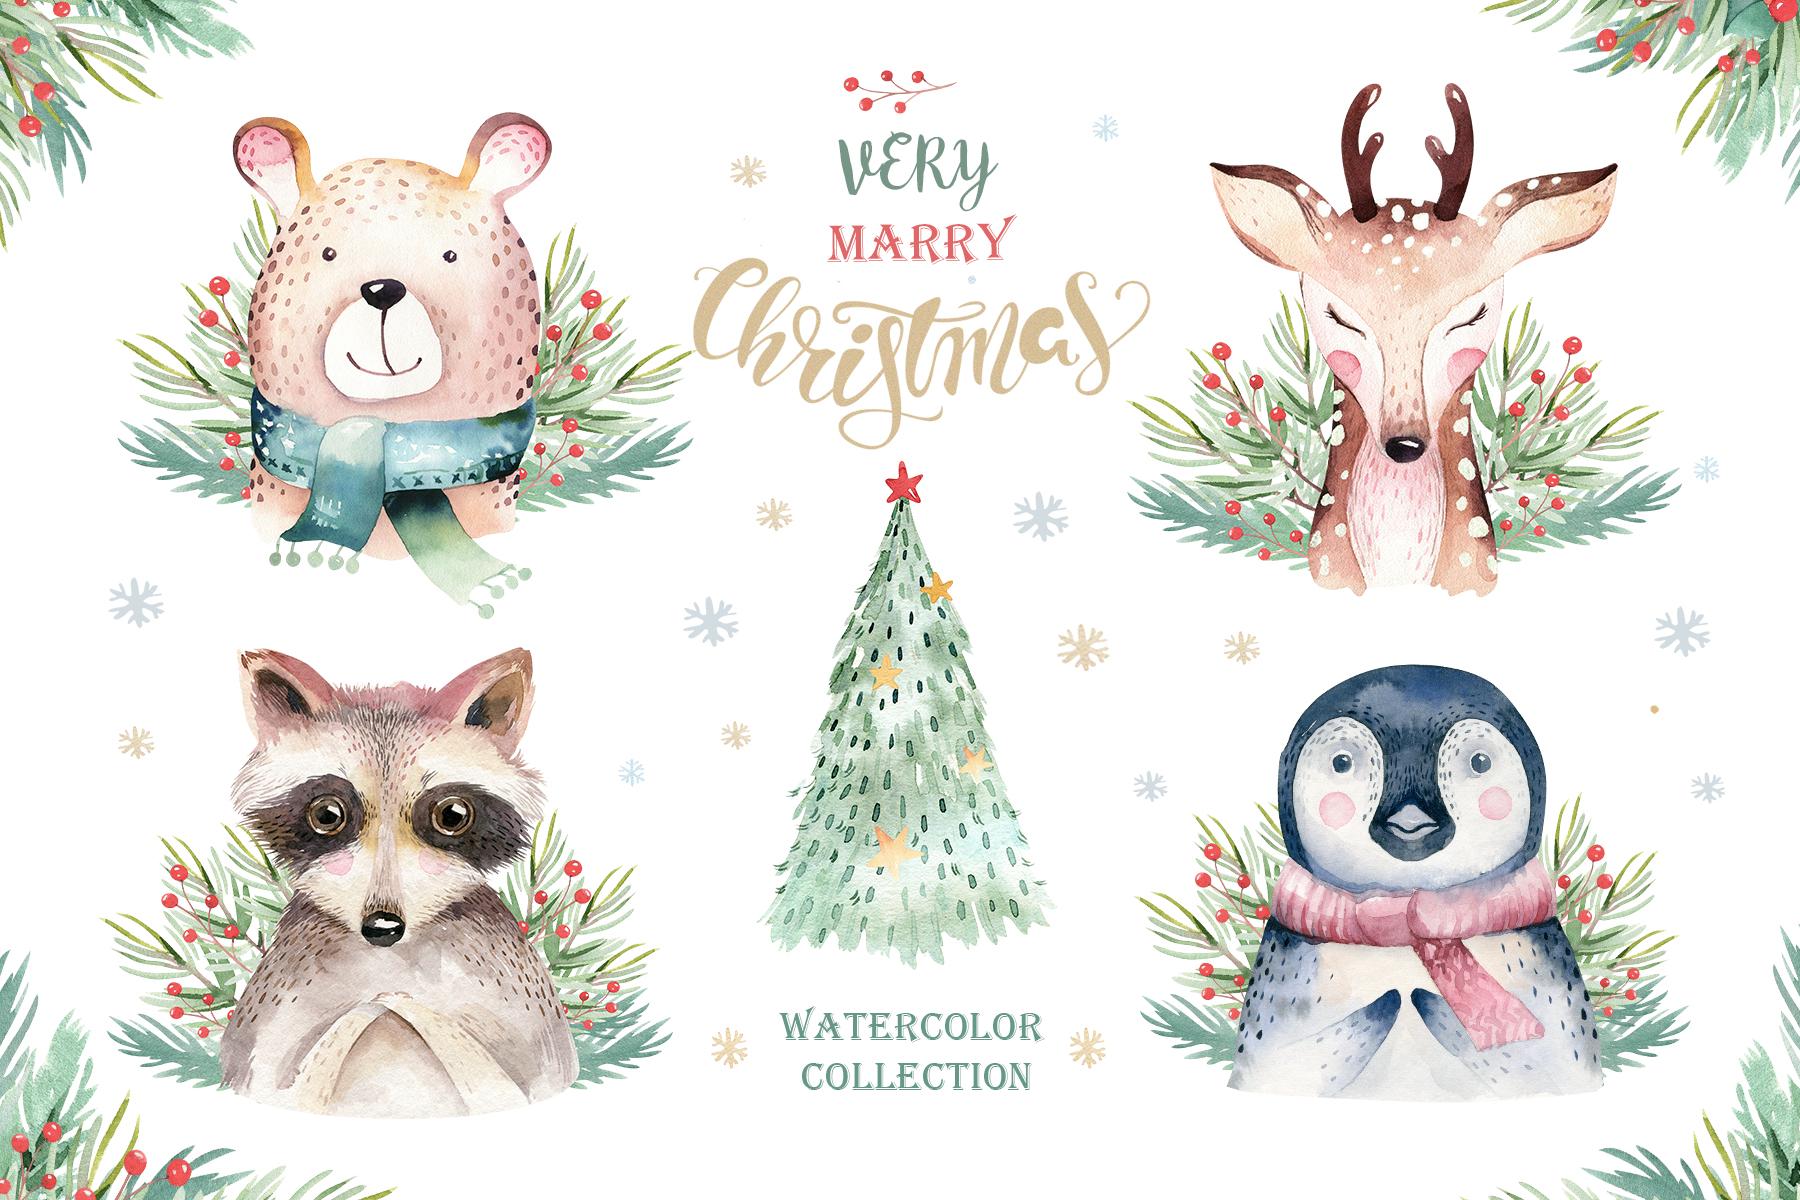 Watercolor Christmas animals raccoon, bear, deer and penguin example image 3